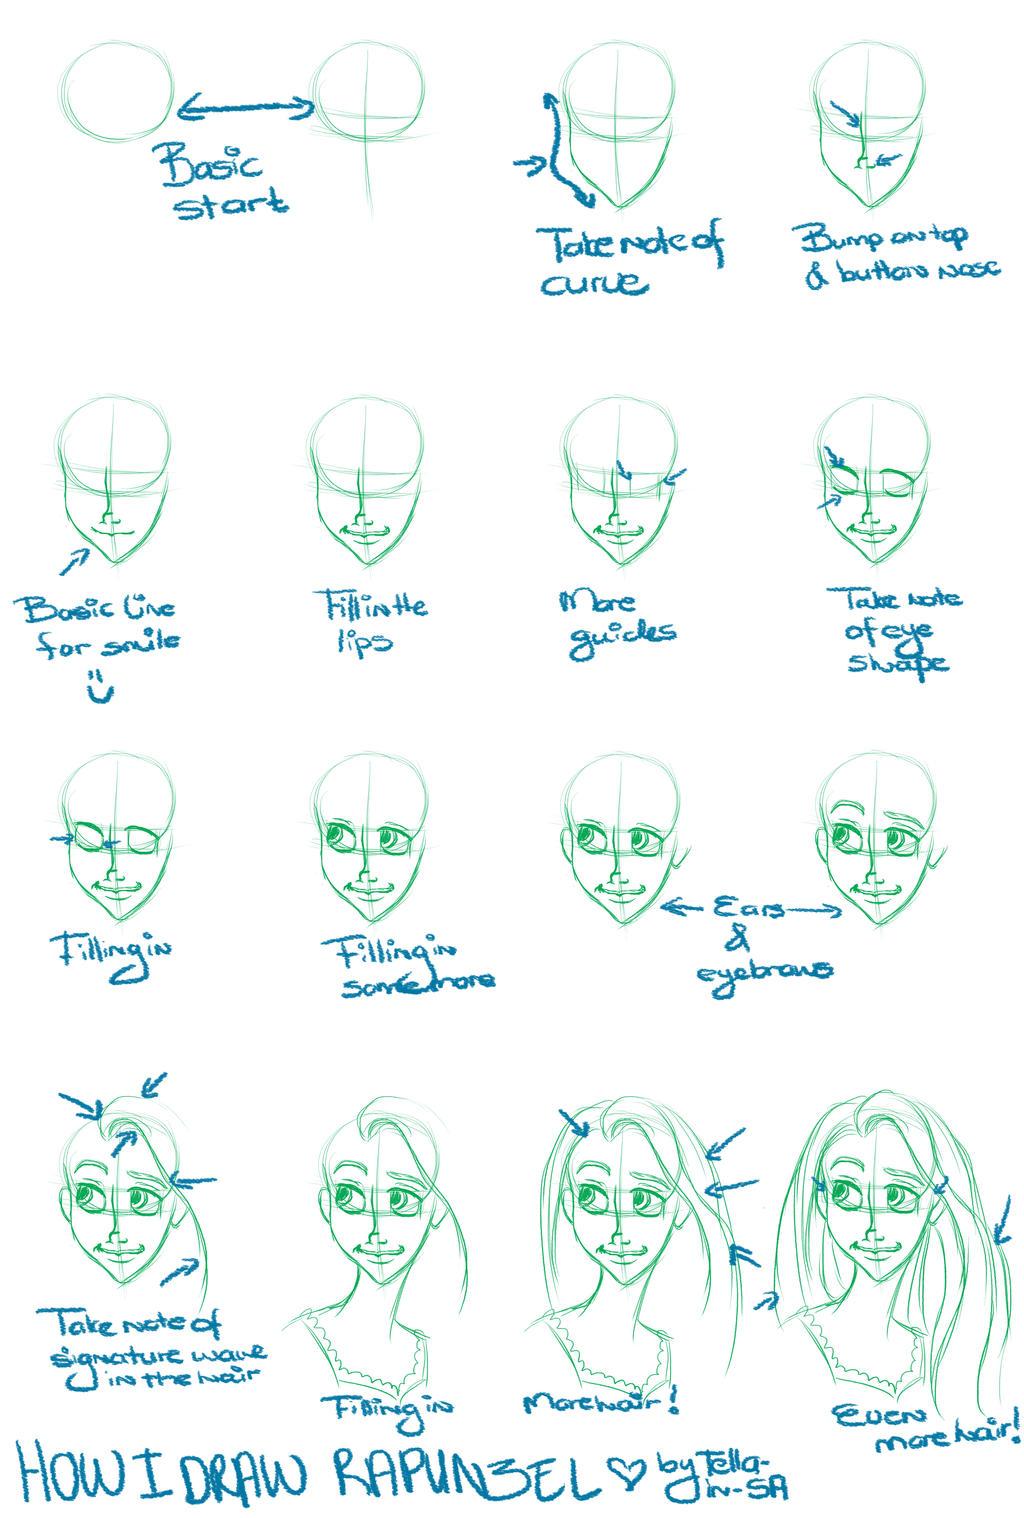 How I draw Rapunzel by Tella-in-SA on DeviantArt